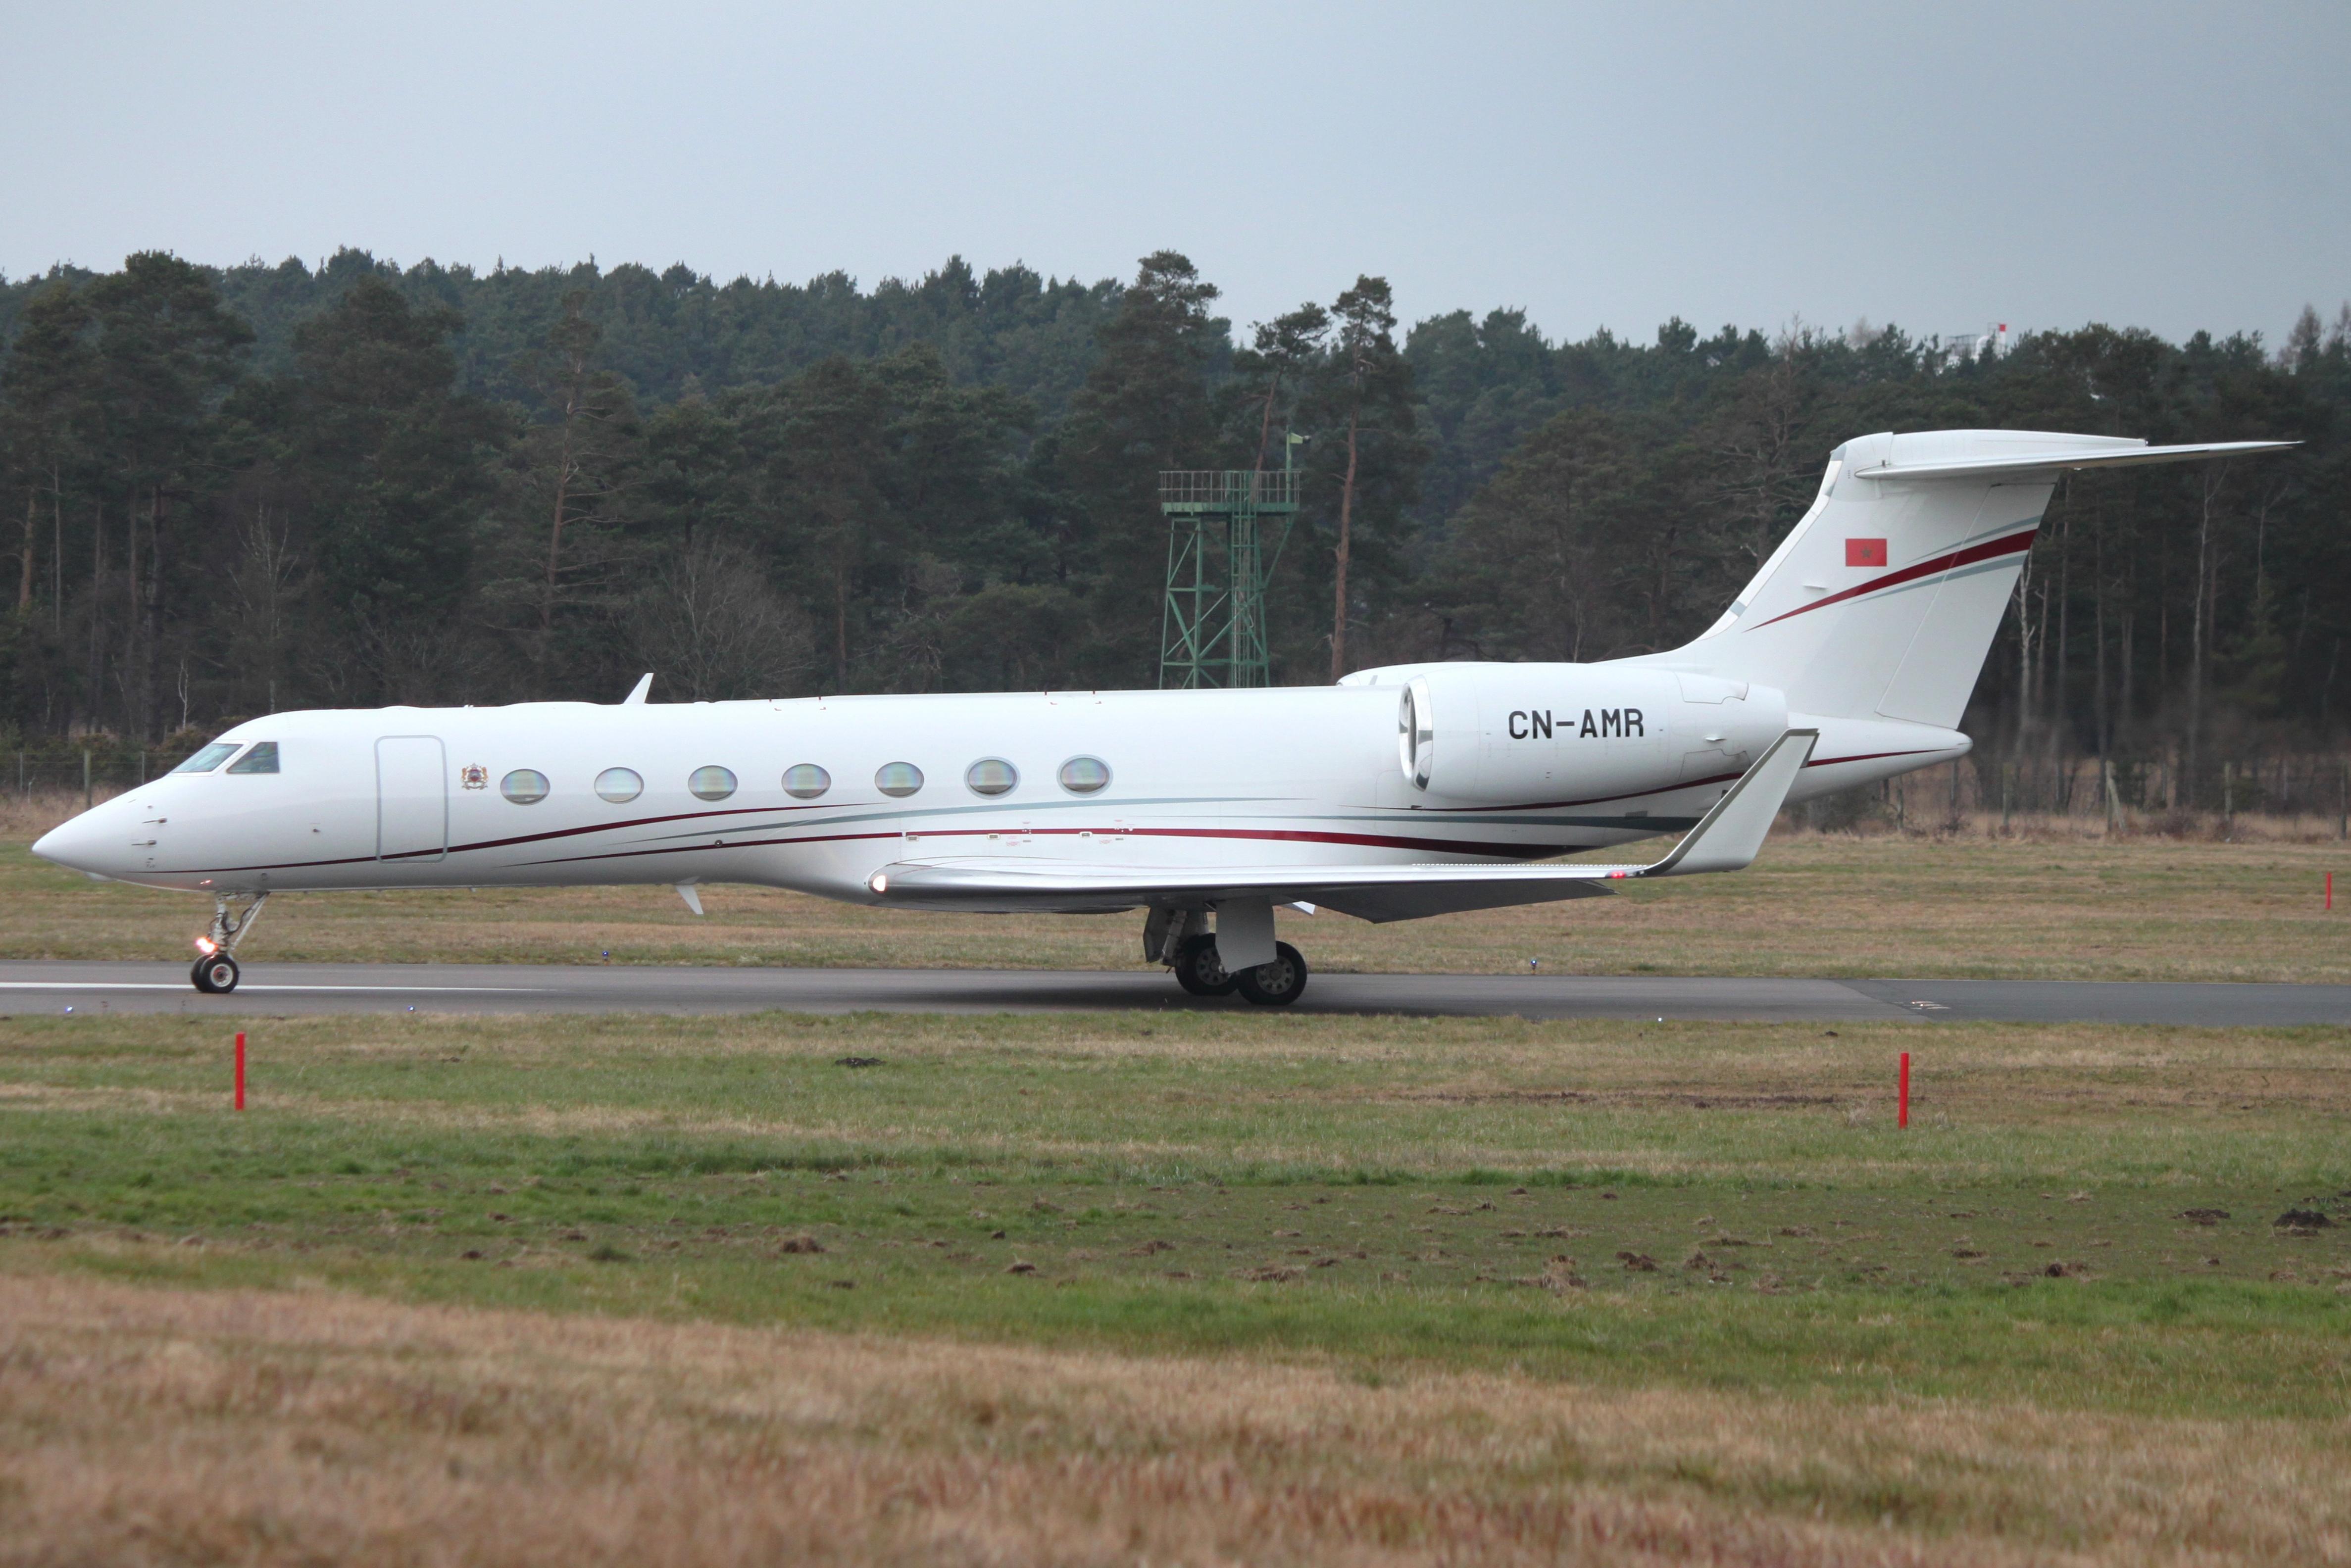 FRA: Avions VIP, Liaison & ECM - Page 19 40597343122_568bbcbdaa_o